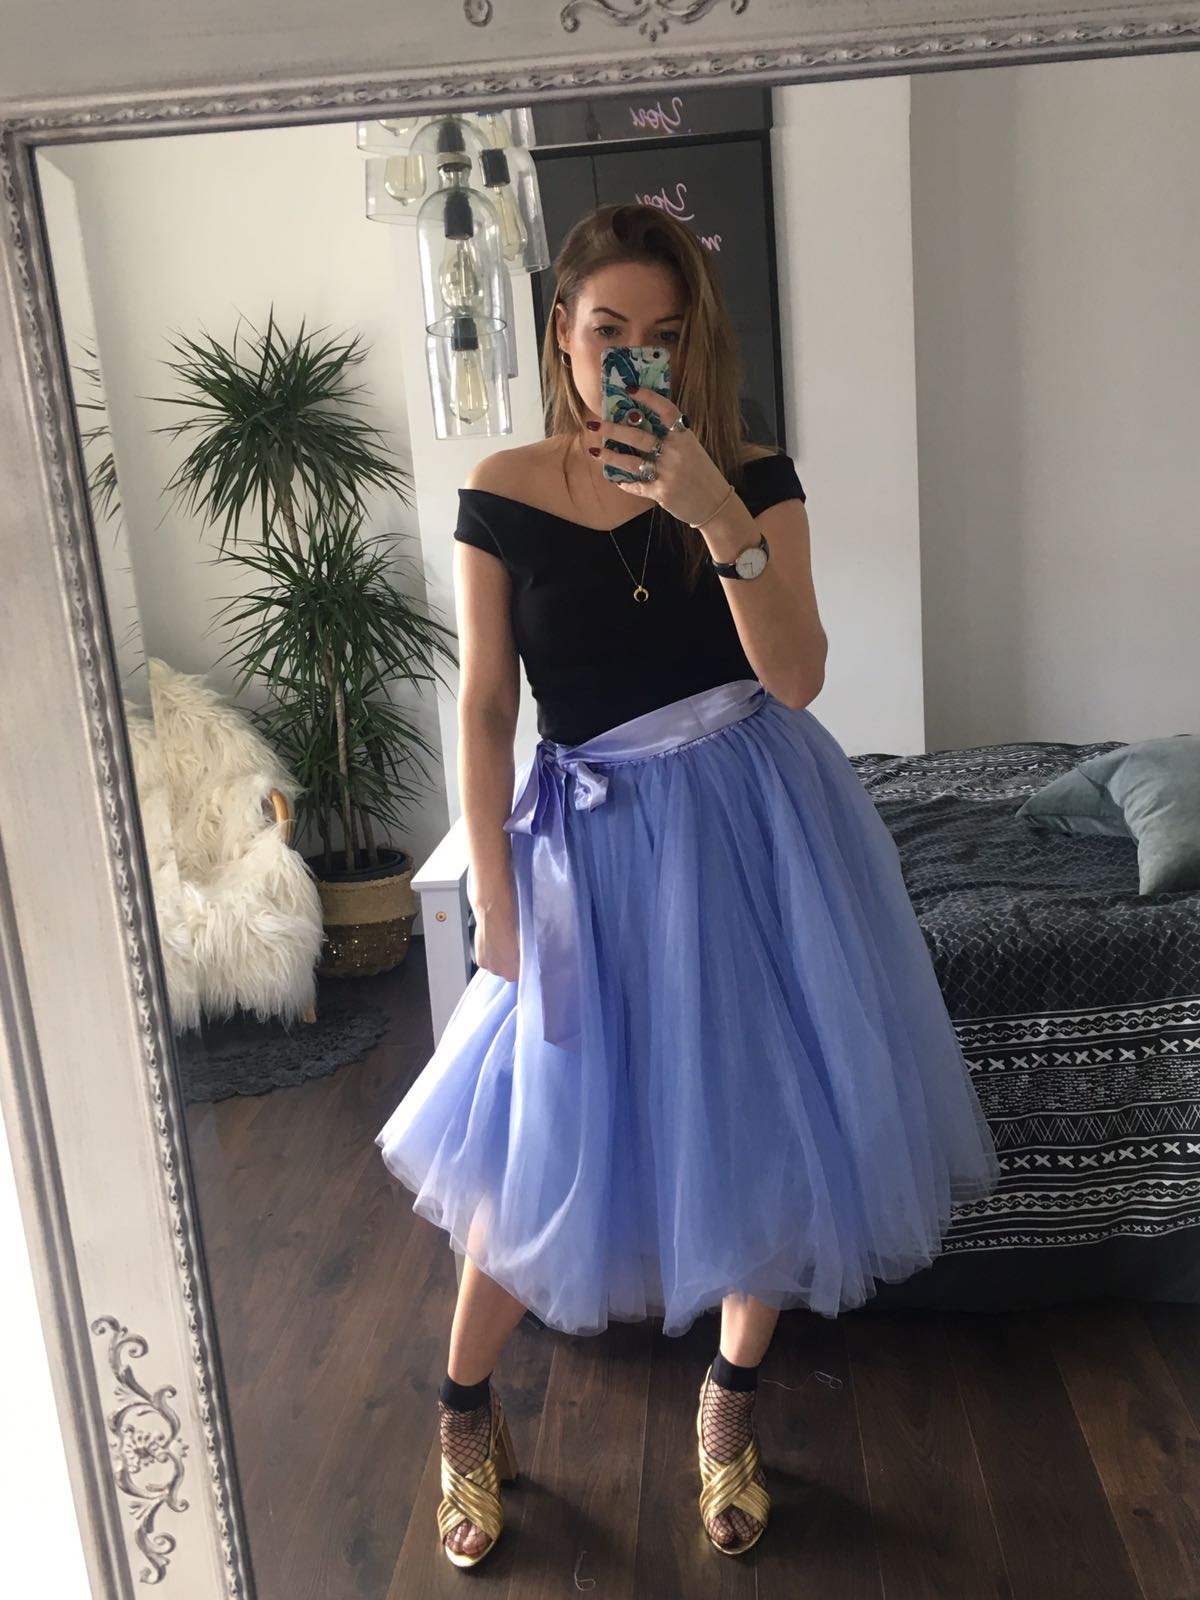 3dfa4e594 Lavender Midi Tulle Tutu Skirt - Elsie's Attic